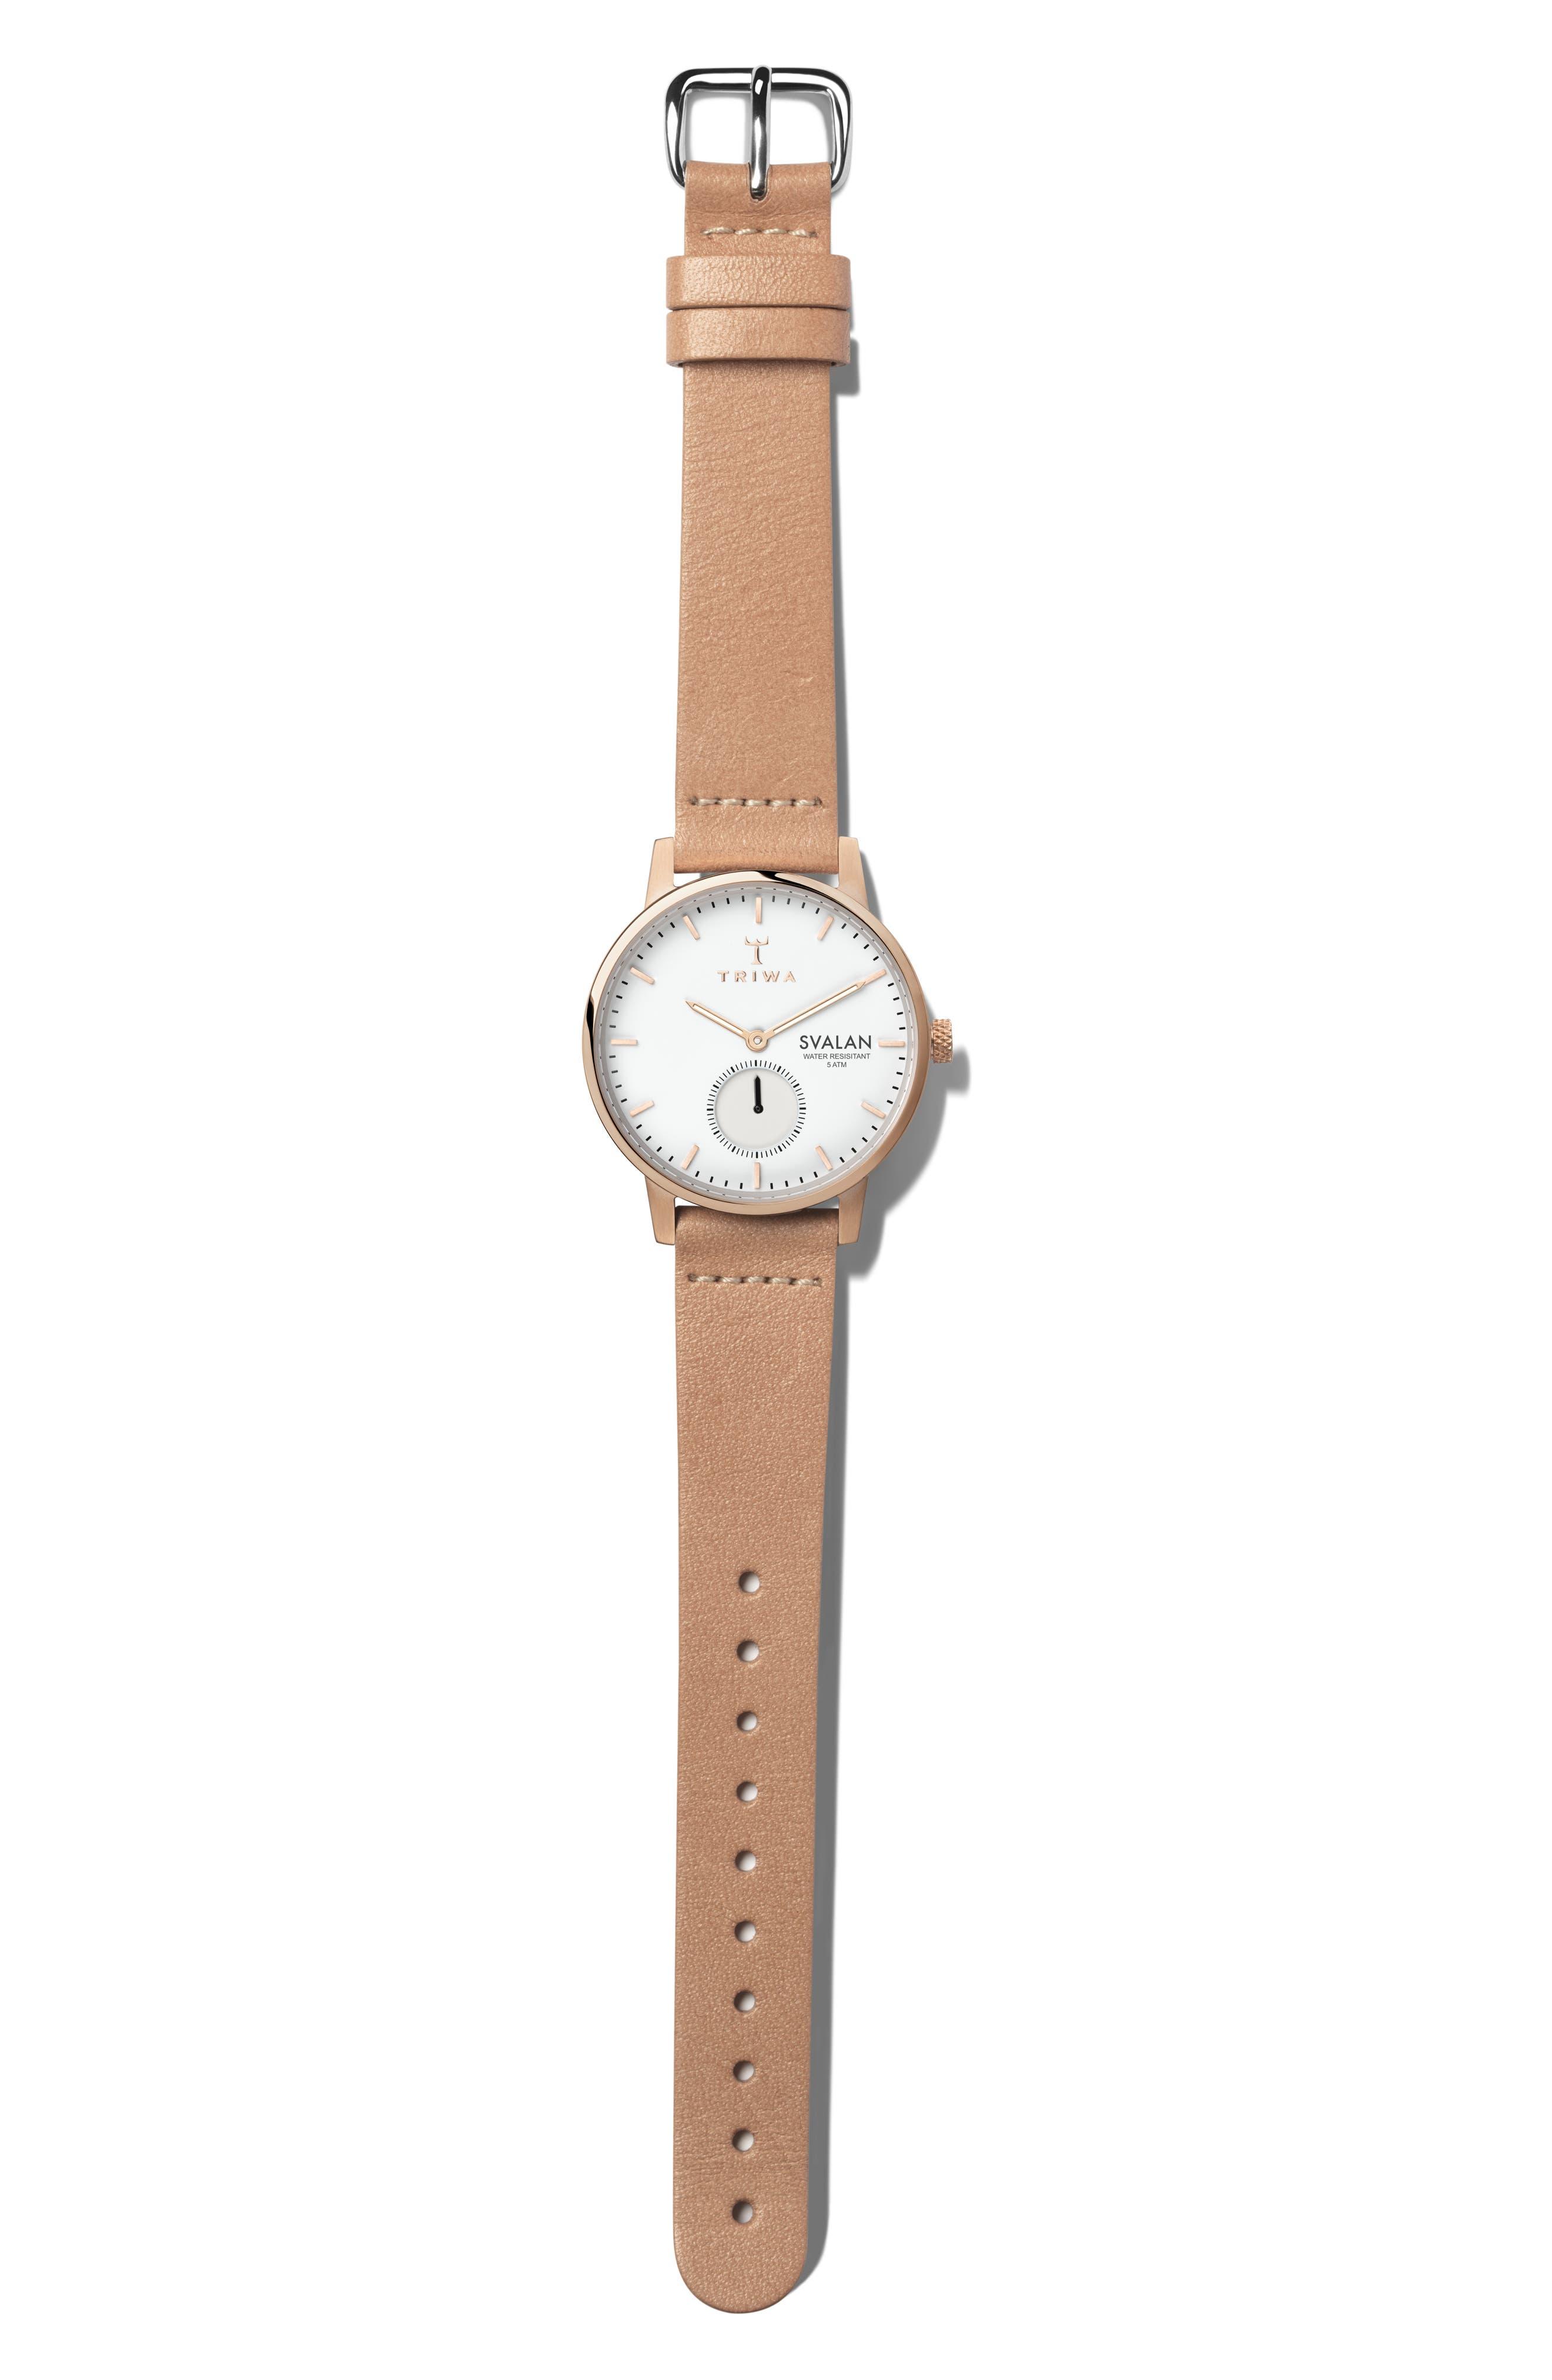 TRIWA Rose Svalan Leather Strap Watch, 34Mm in Rose/ White/ Gold